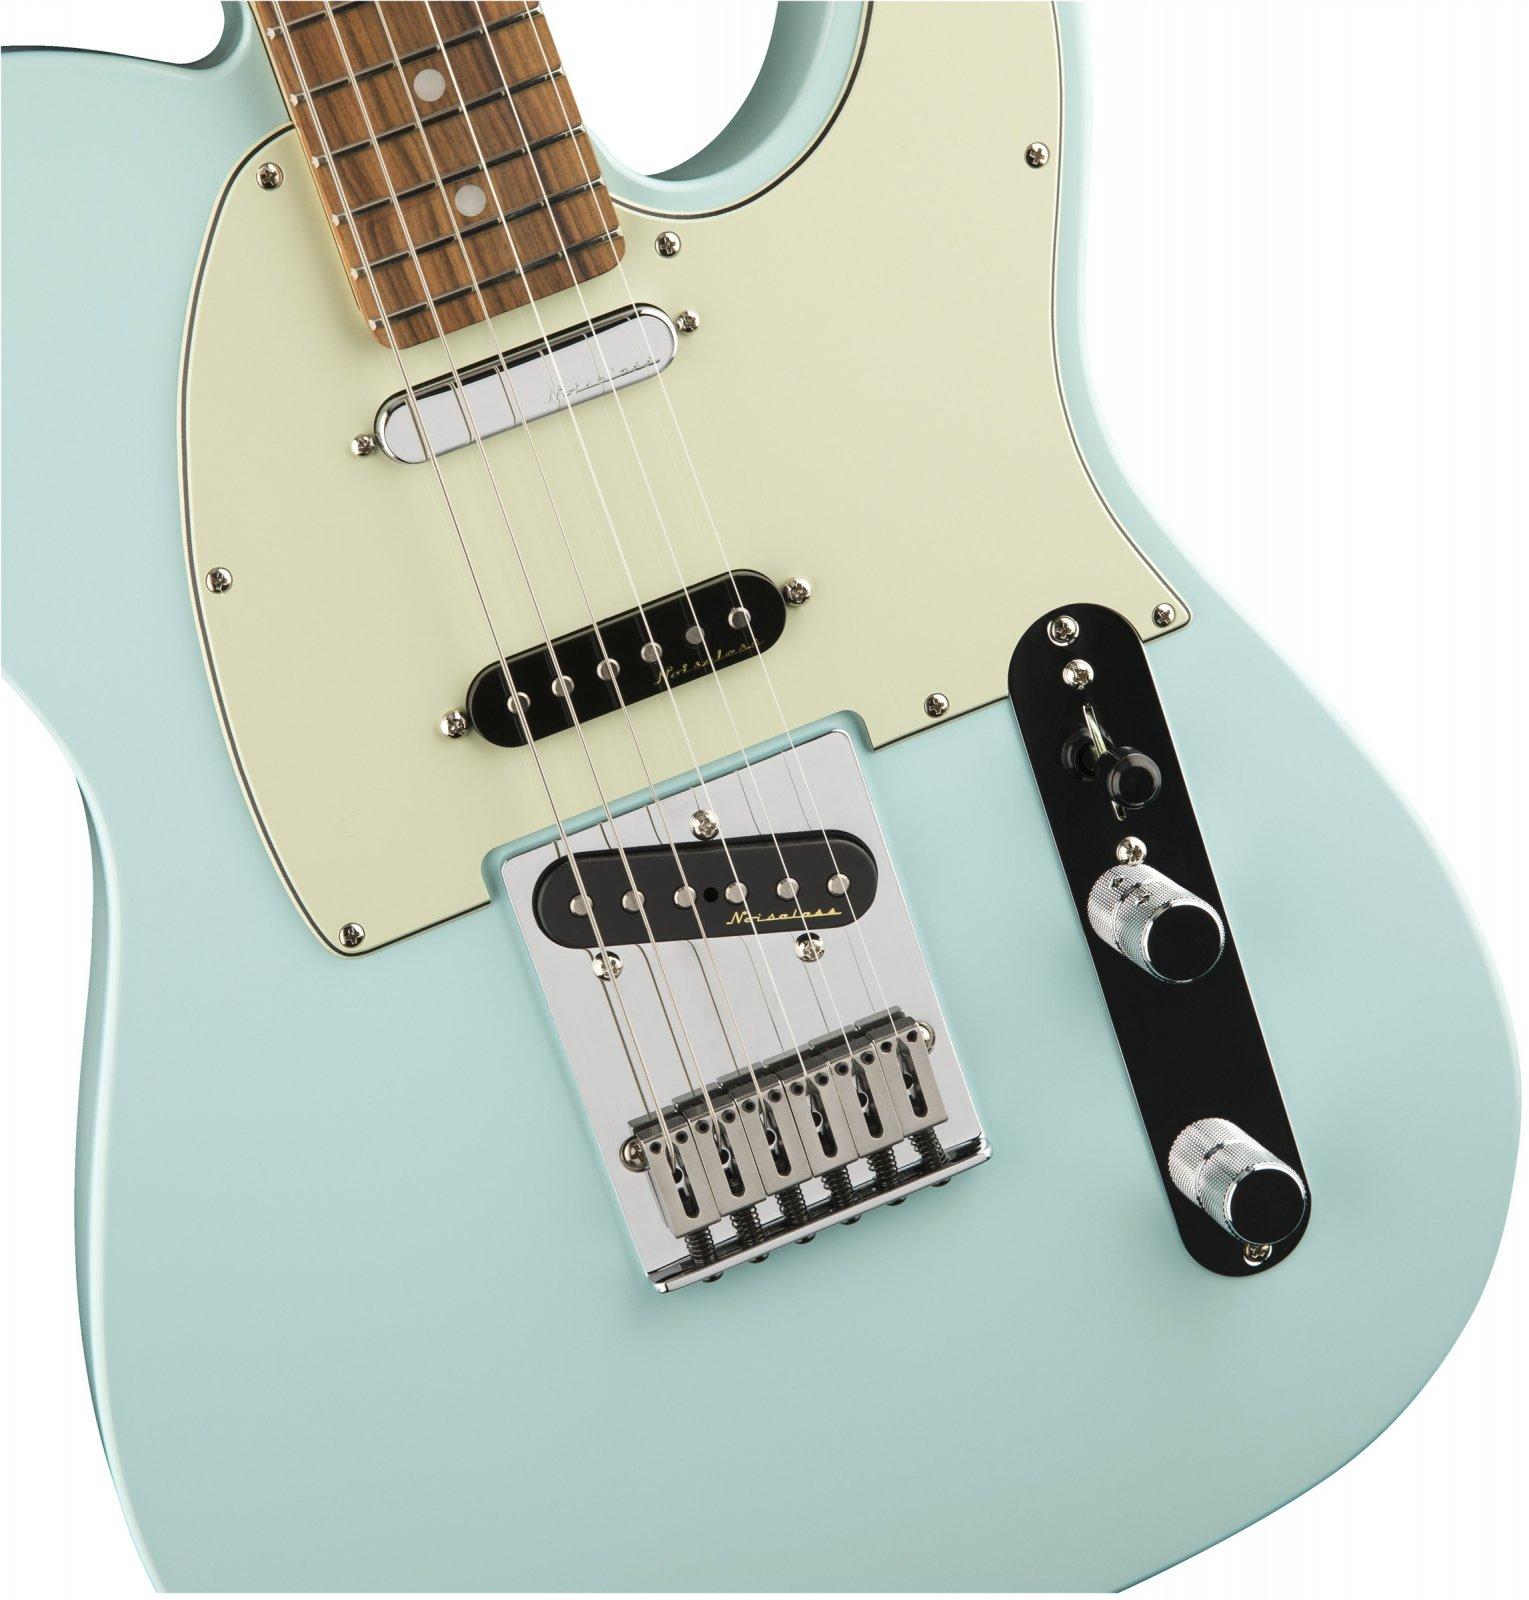 Fender Deluxe Nashville Telecaster - Daphne Blue w/ Pao Ferro Fingerboard